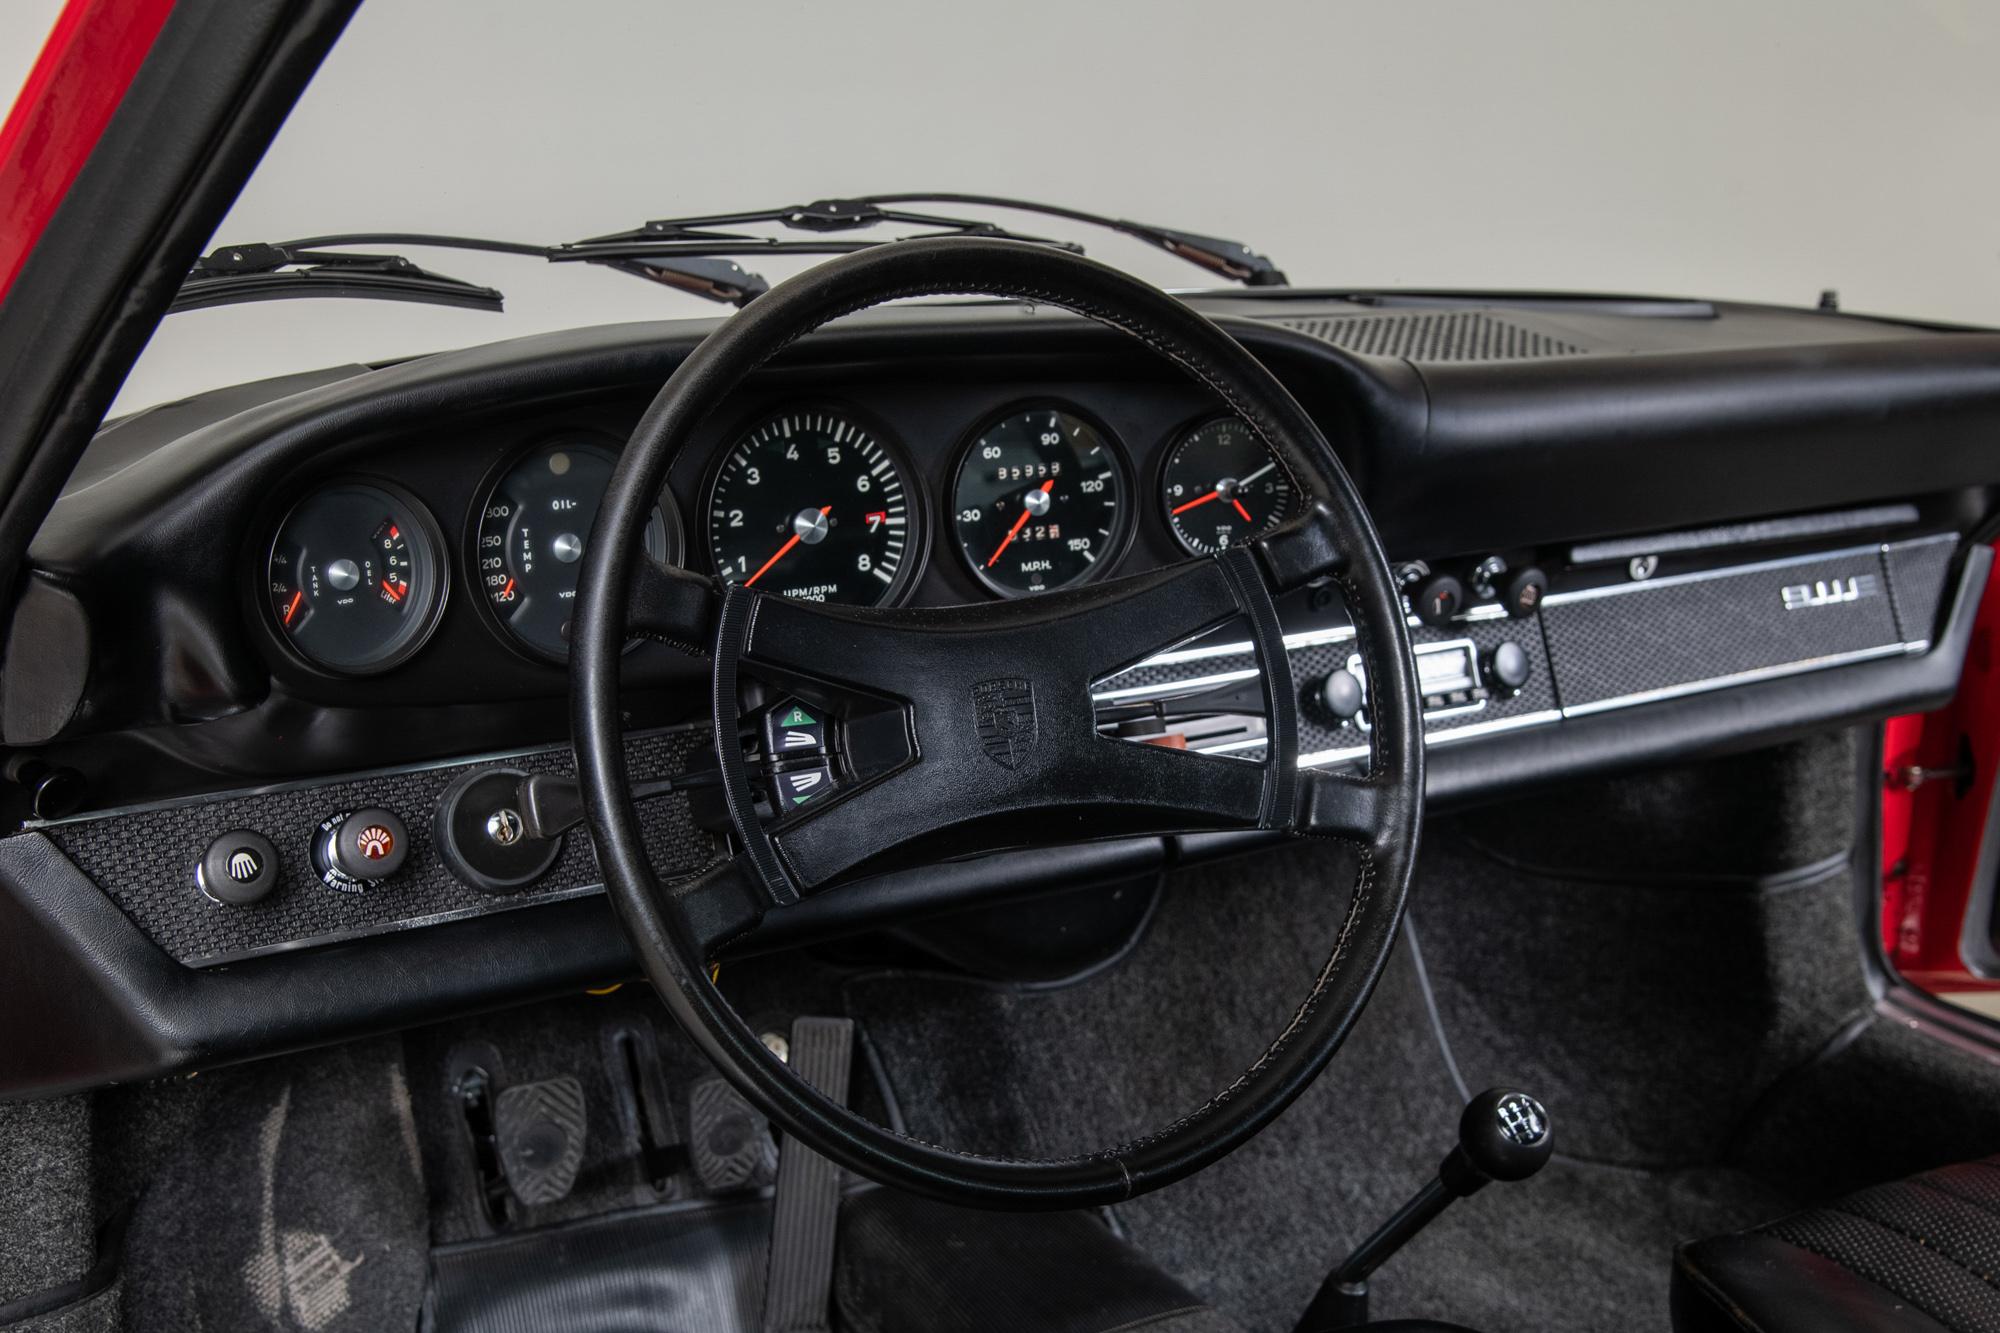 1969 Porsche 911E Targa , RED, VIN 119210805, MILEAGE 85926